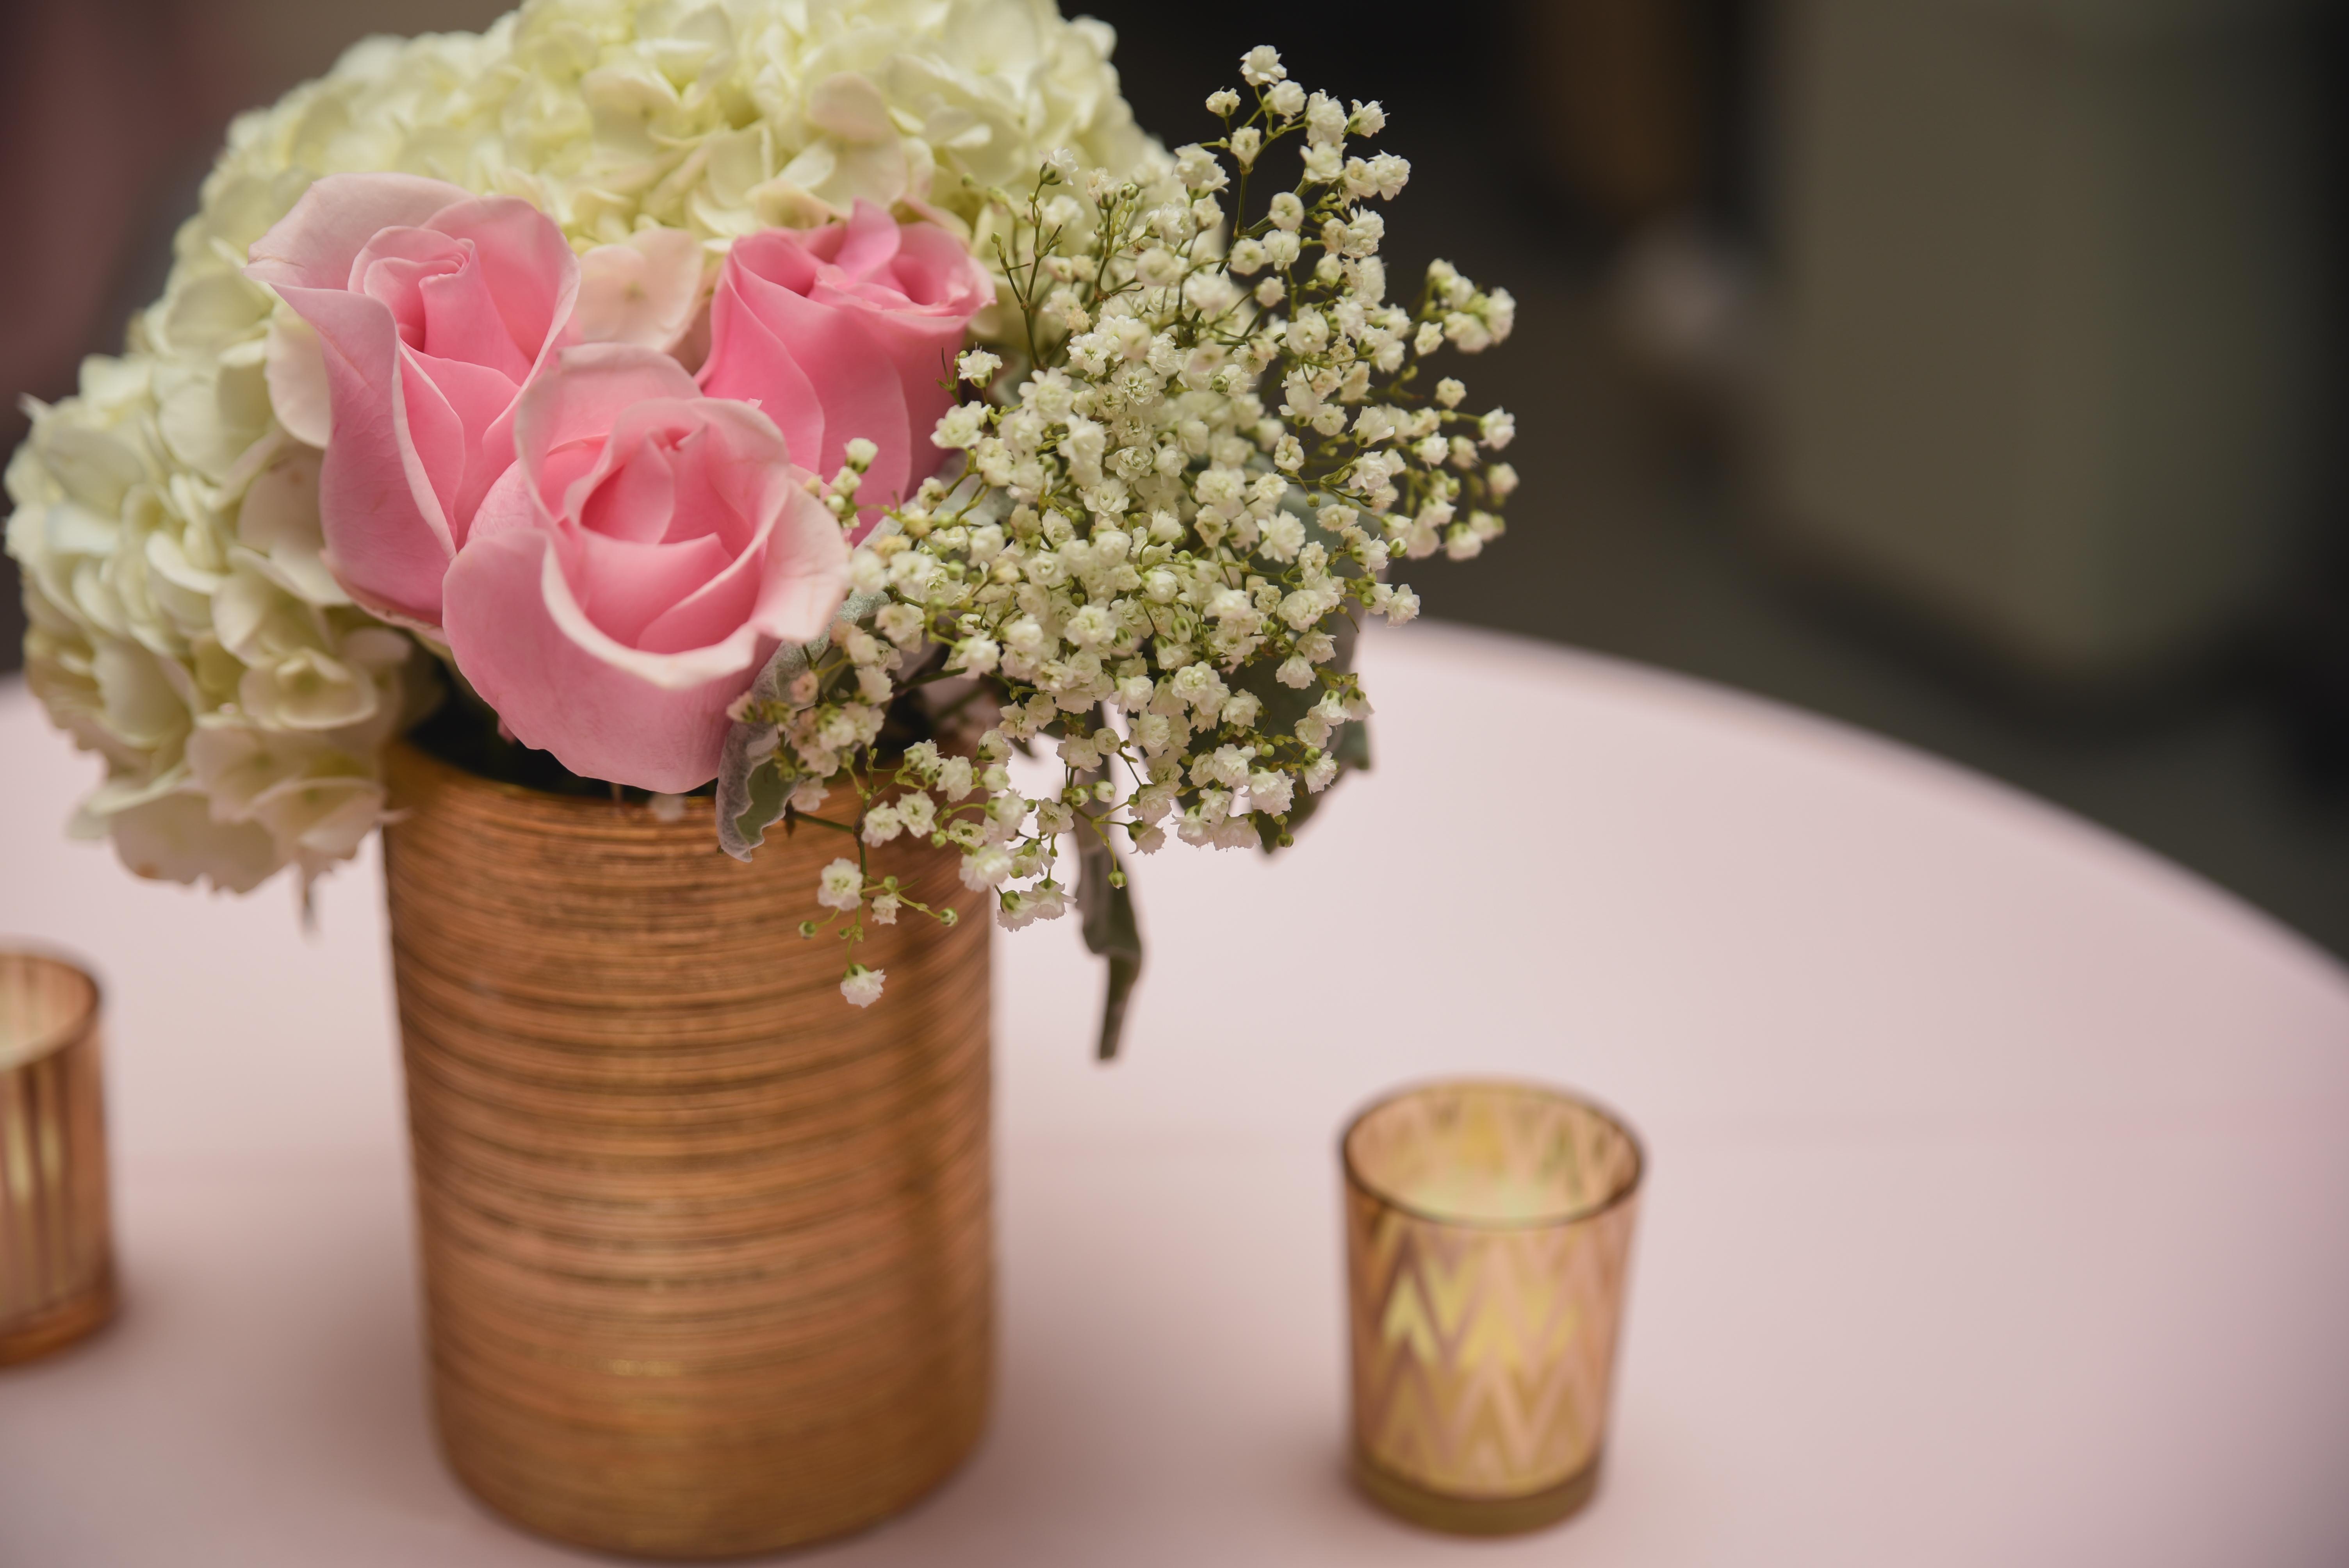 Wedding-Decor-Floral-Centerpiece